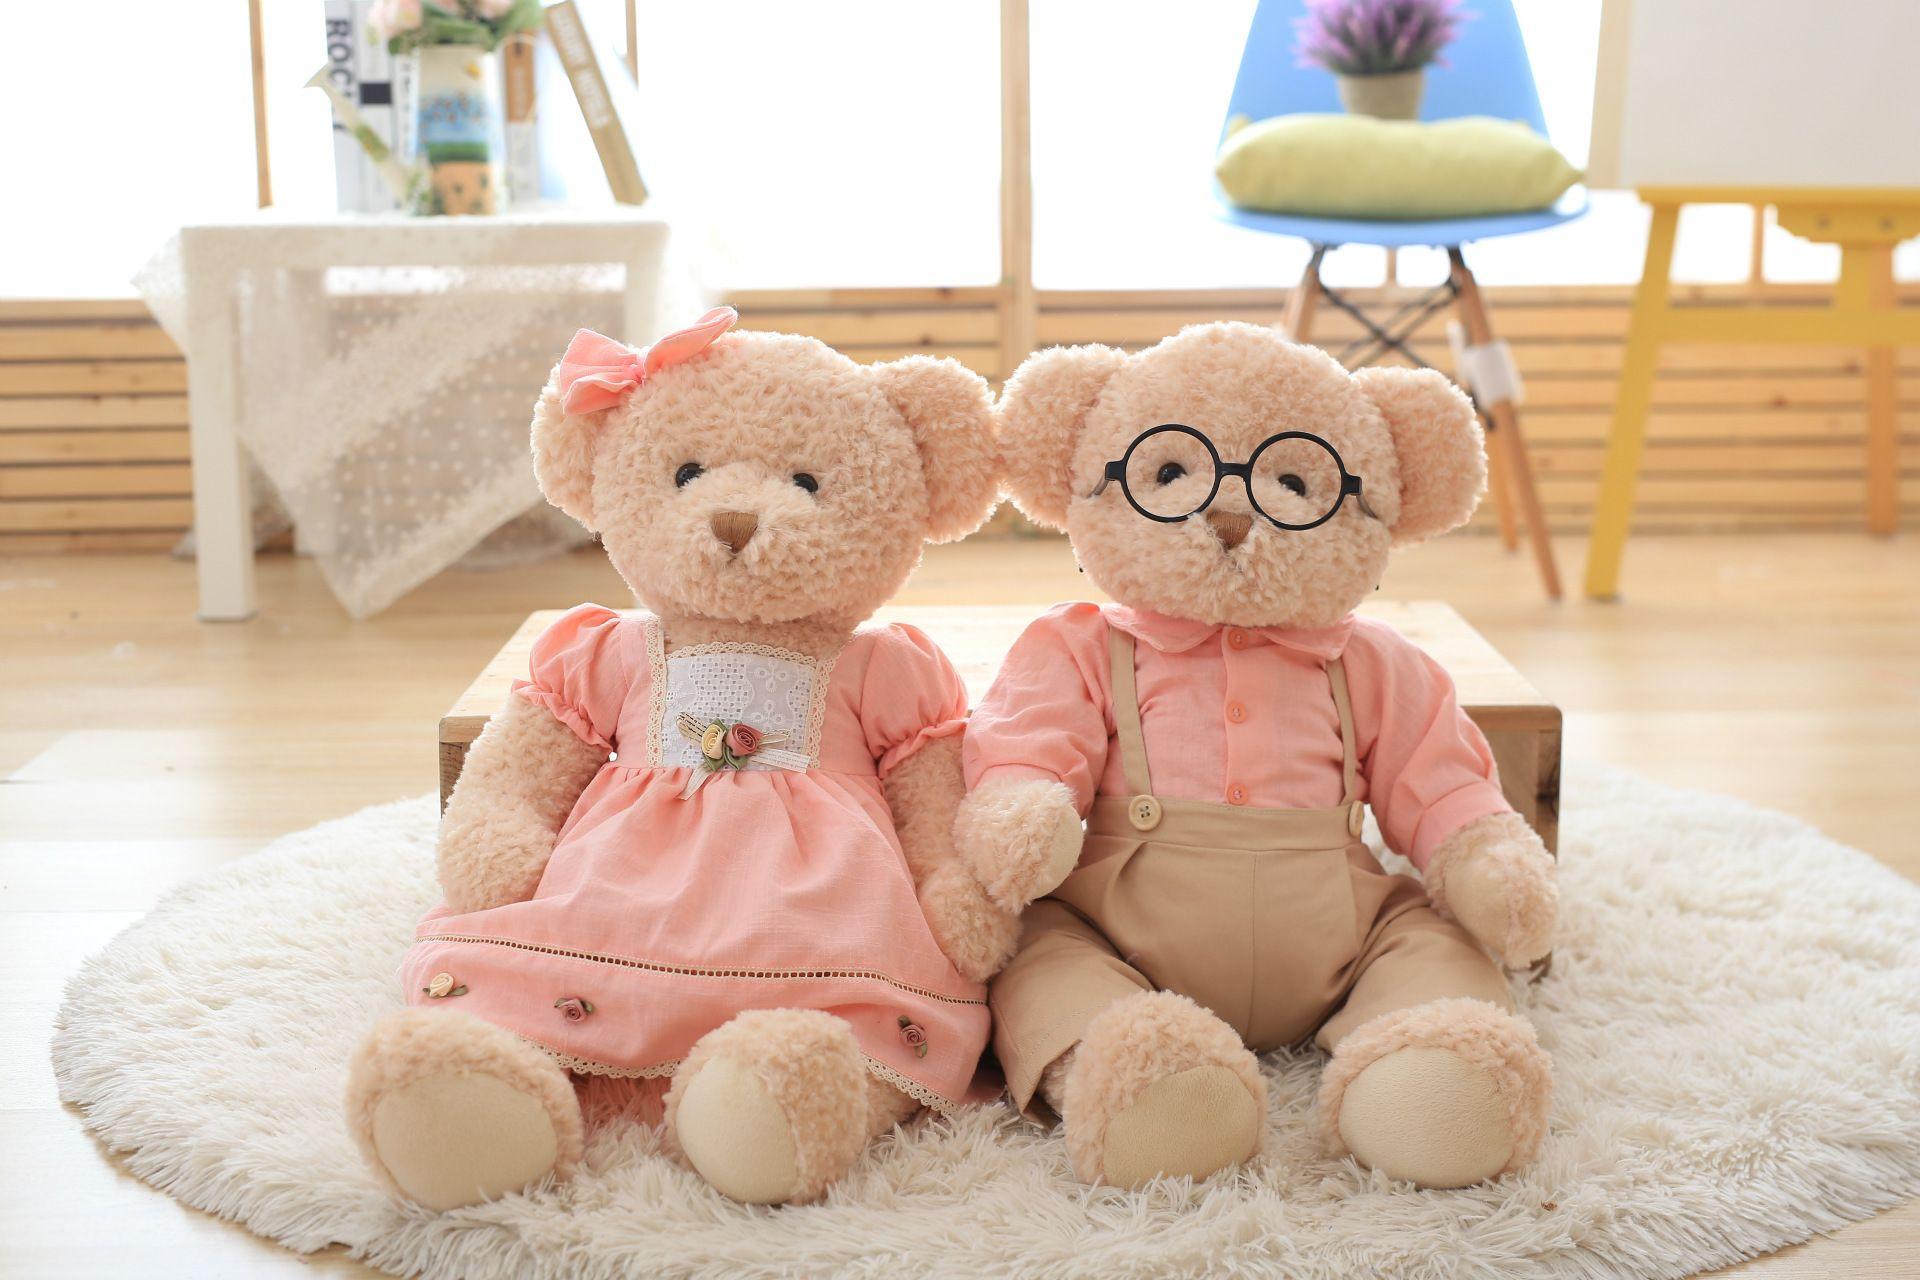 2019 Korean Couple Wedding Teddy Bear Plush Toy Doll Wedding Gift